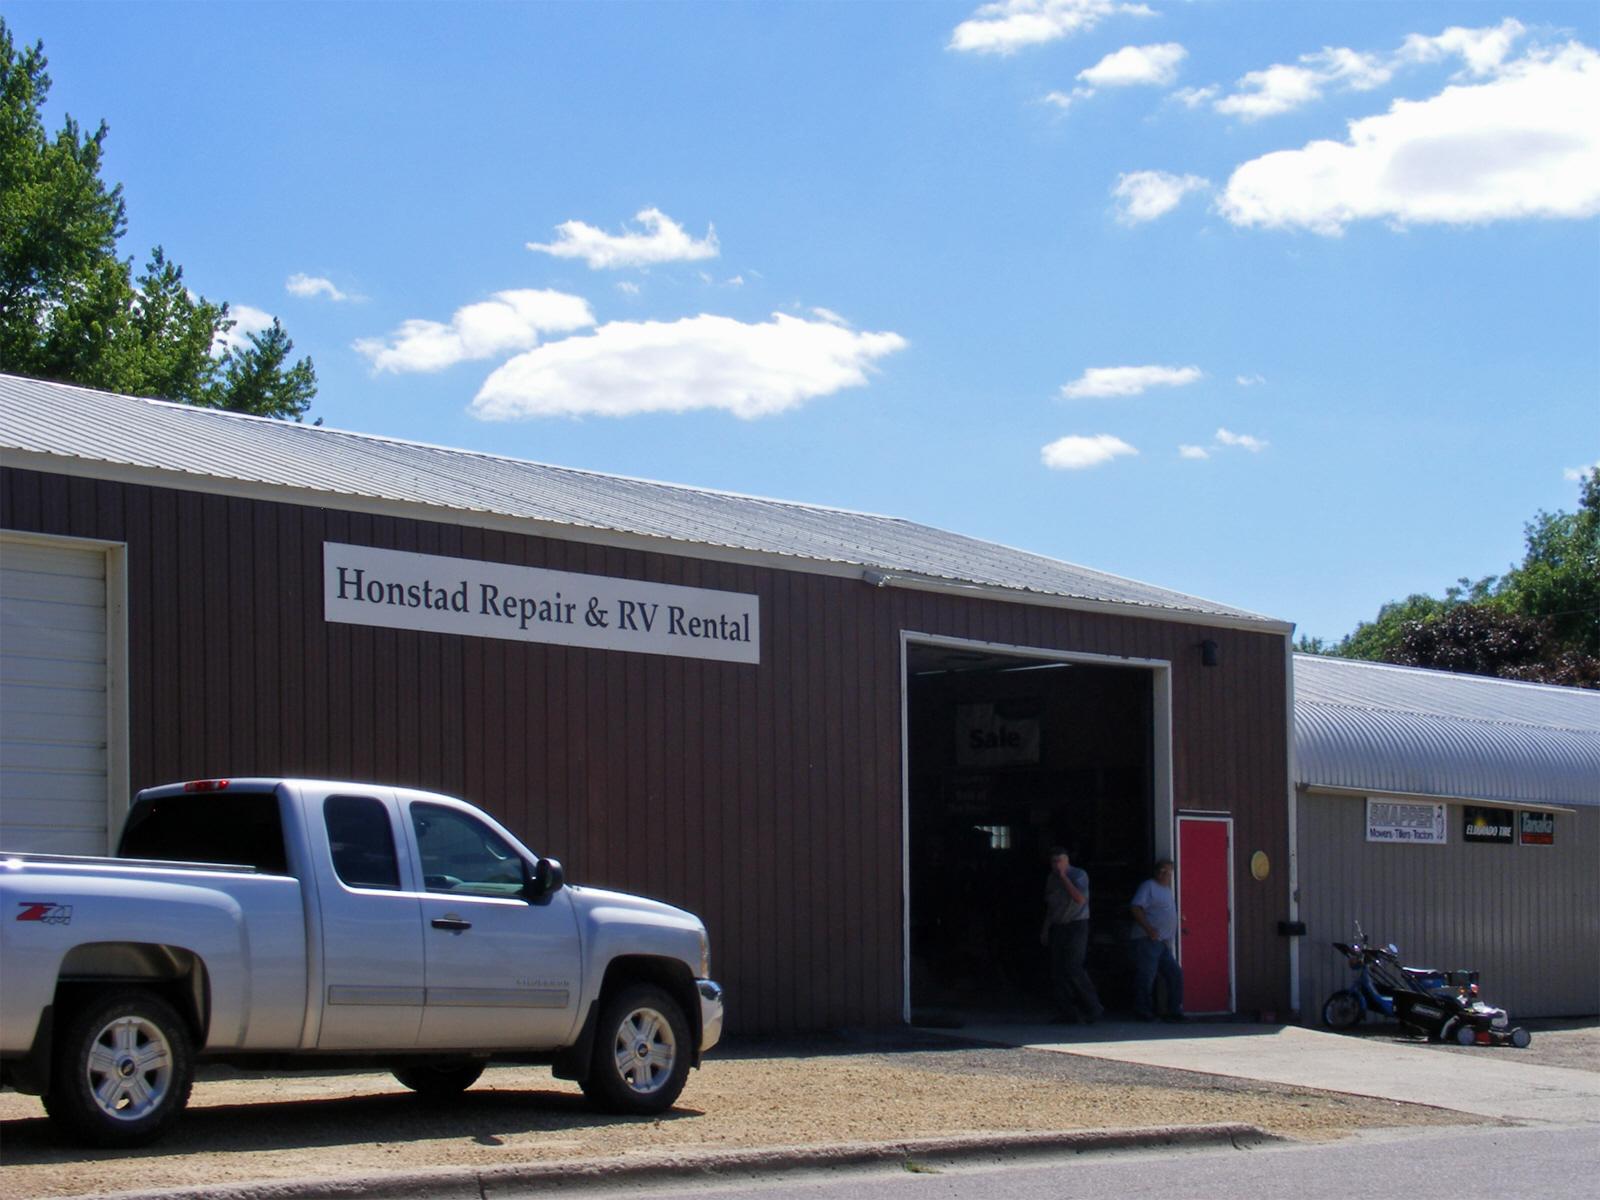 ... Honstad Repair and RV Rentals, Lake Crystal Minnesota